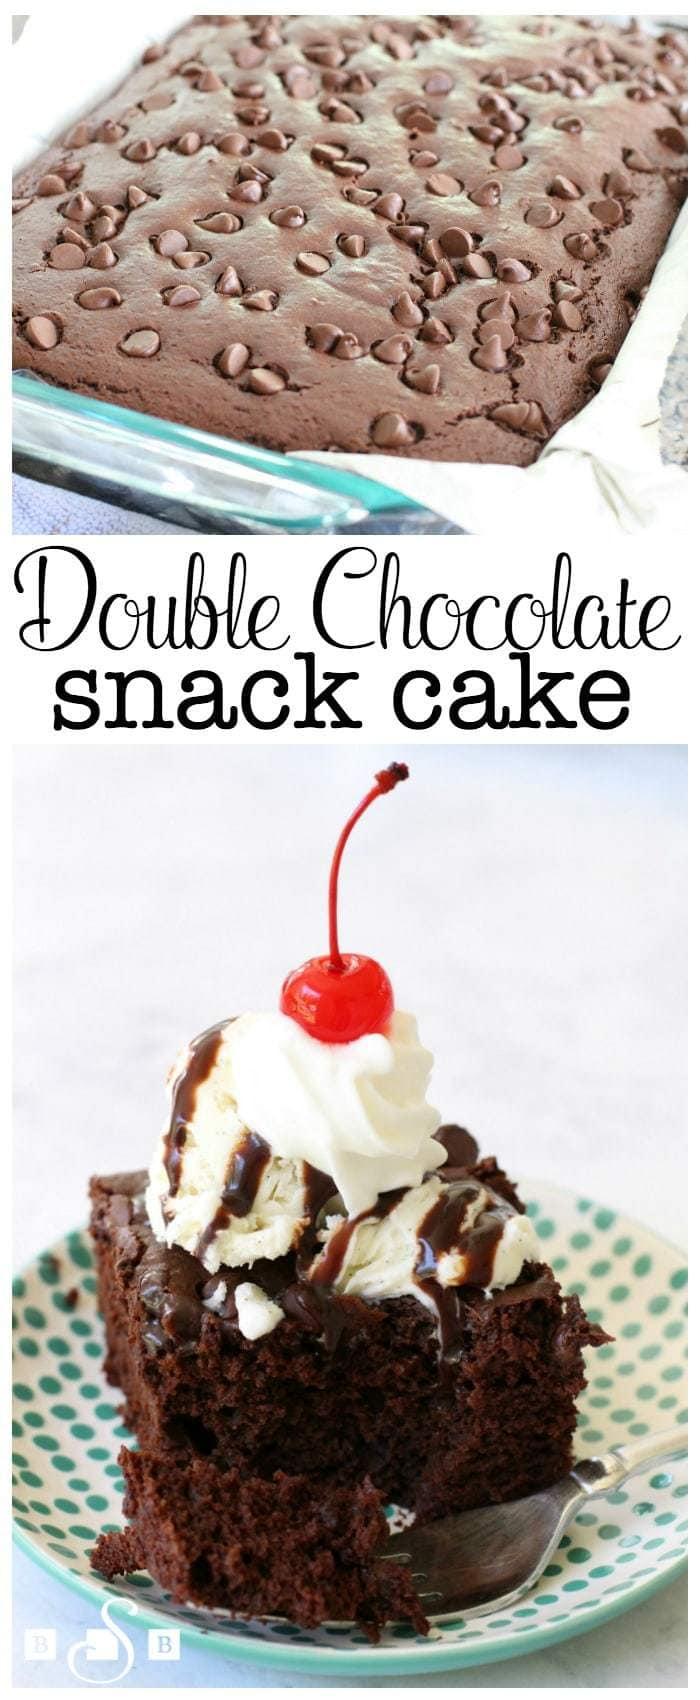 Cake Mix Sour Cream Chocolate Chips